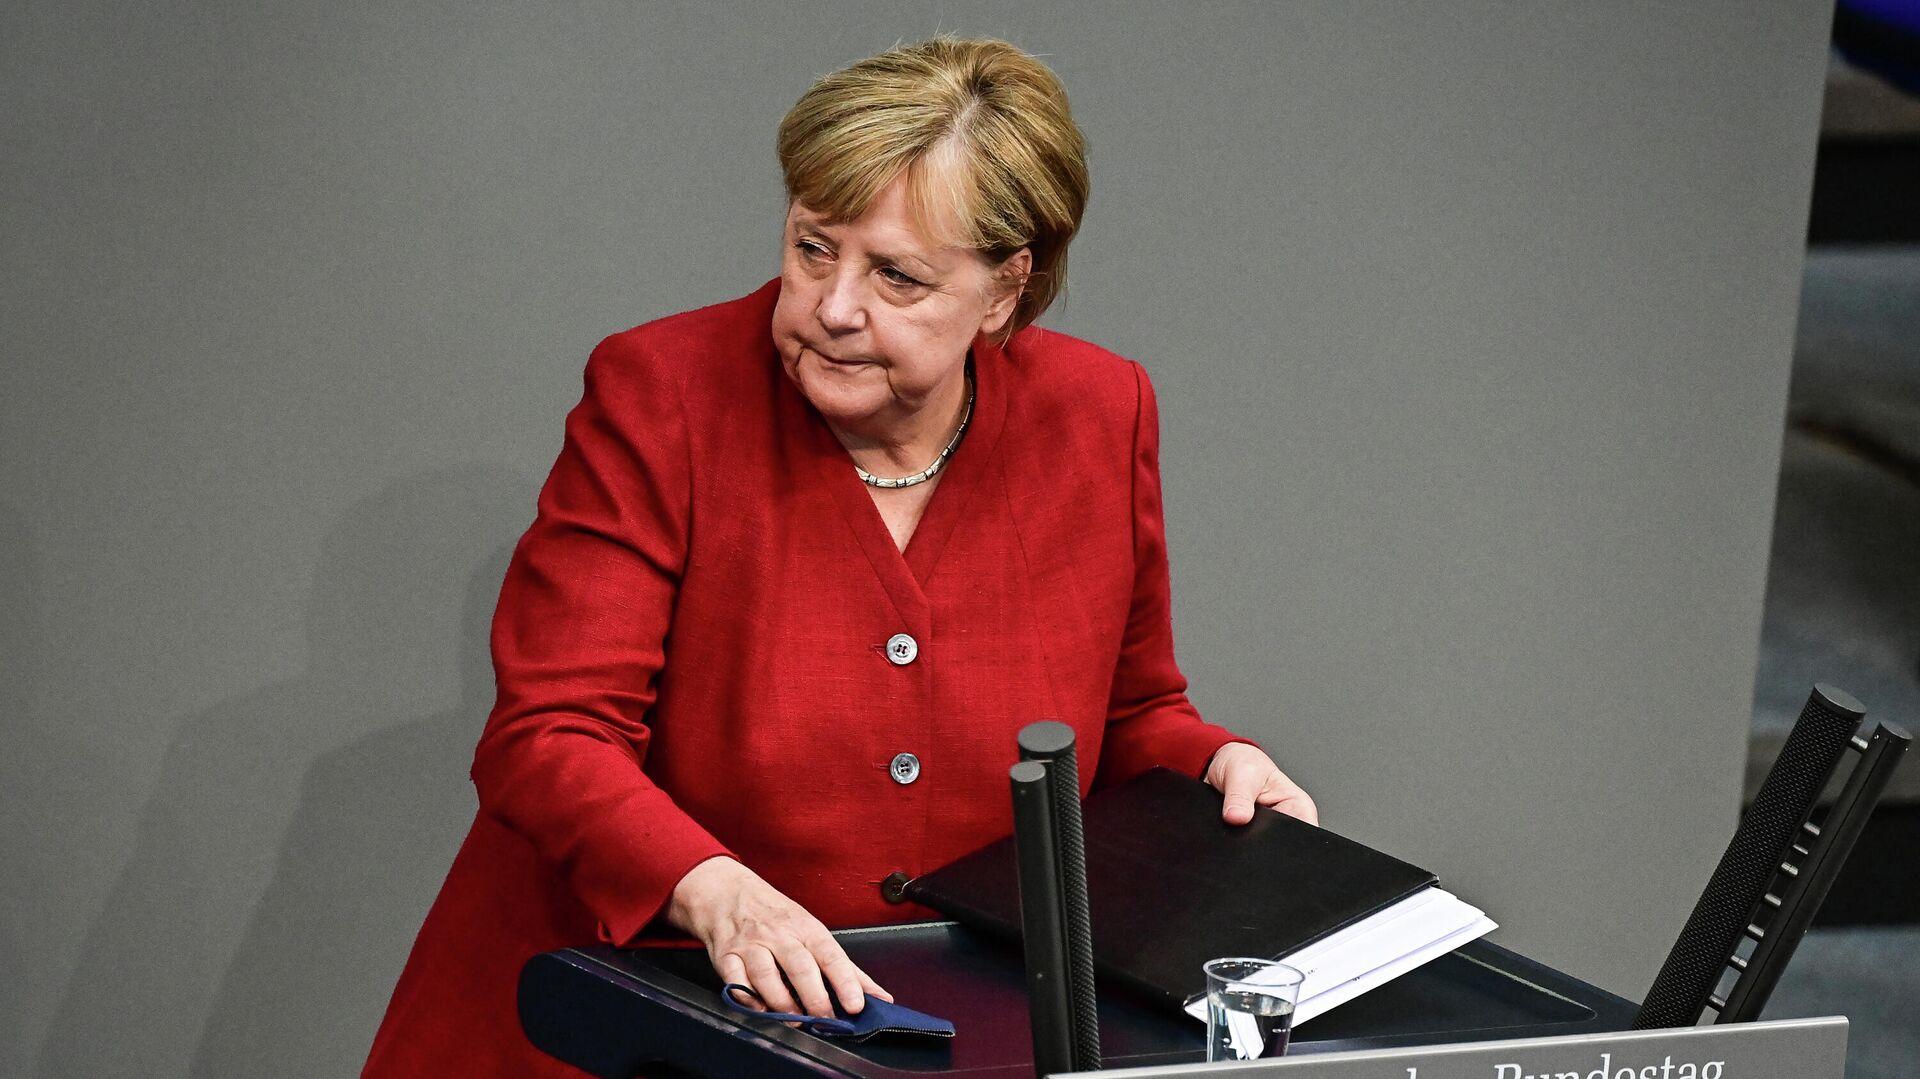 Федеральный канцлер ФРГ Ангела Меркель - Sputnik Таджикистан, 1920, 25.08.2021